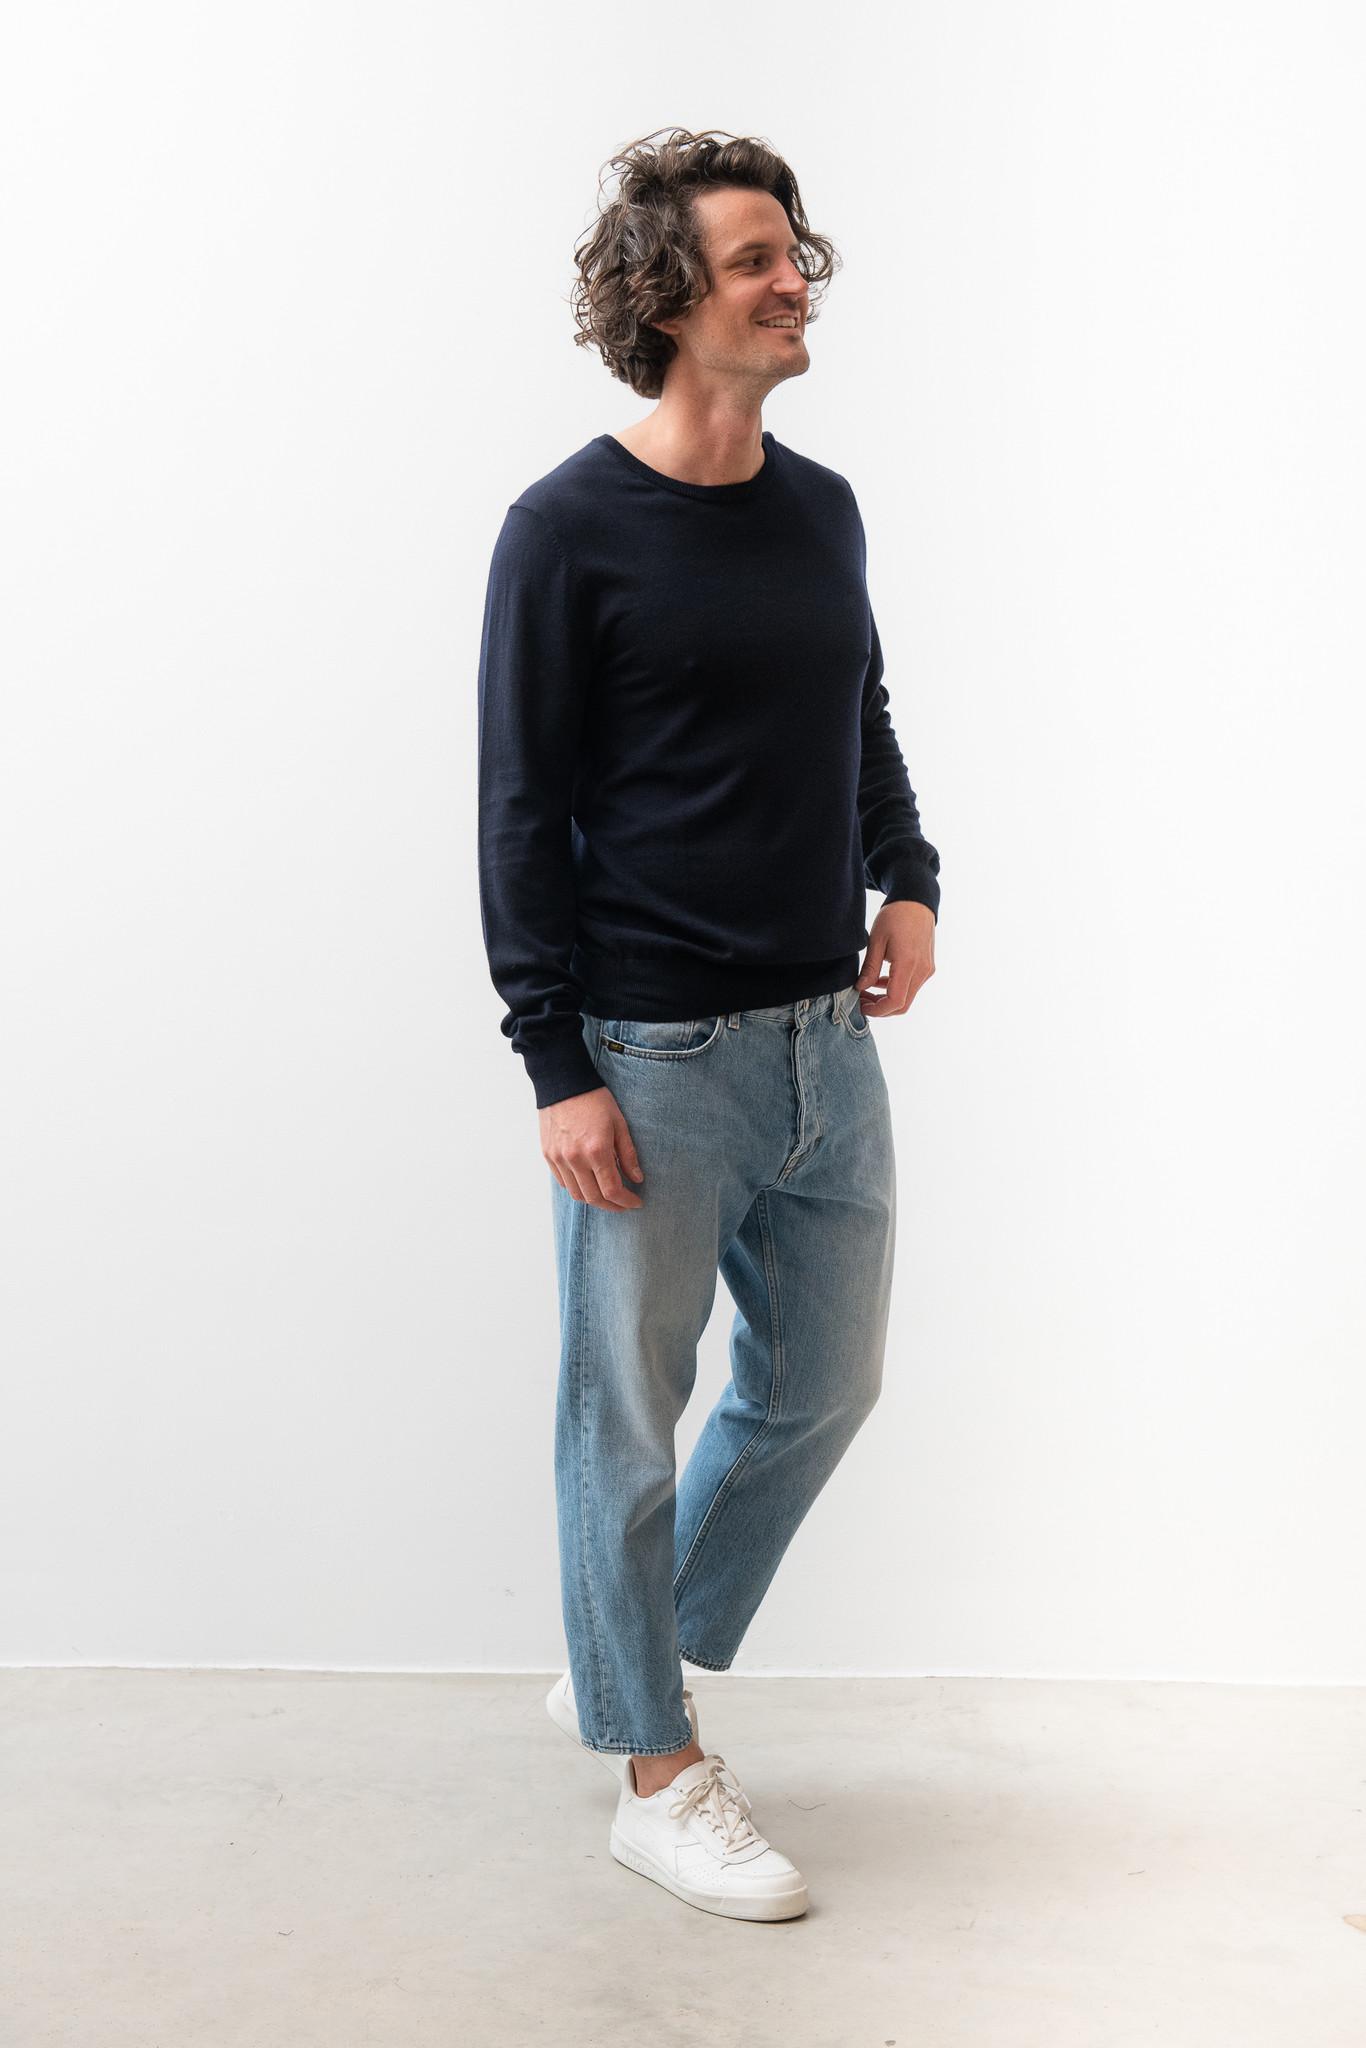 Matias Fine Italian Wool Knit Light Ink-5